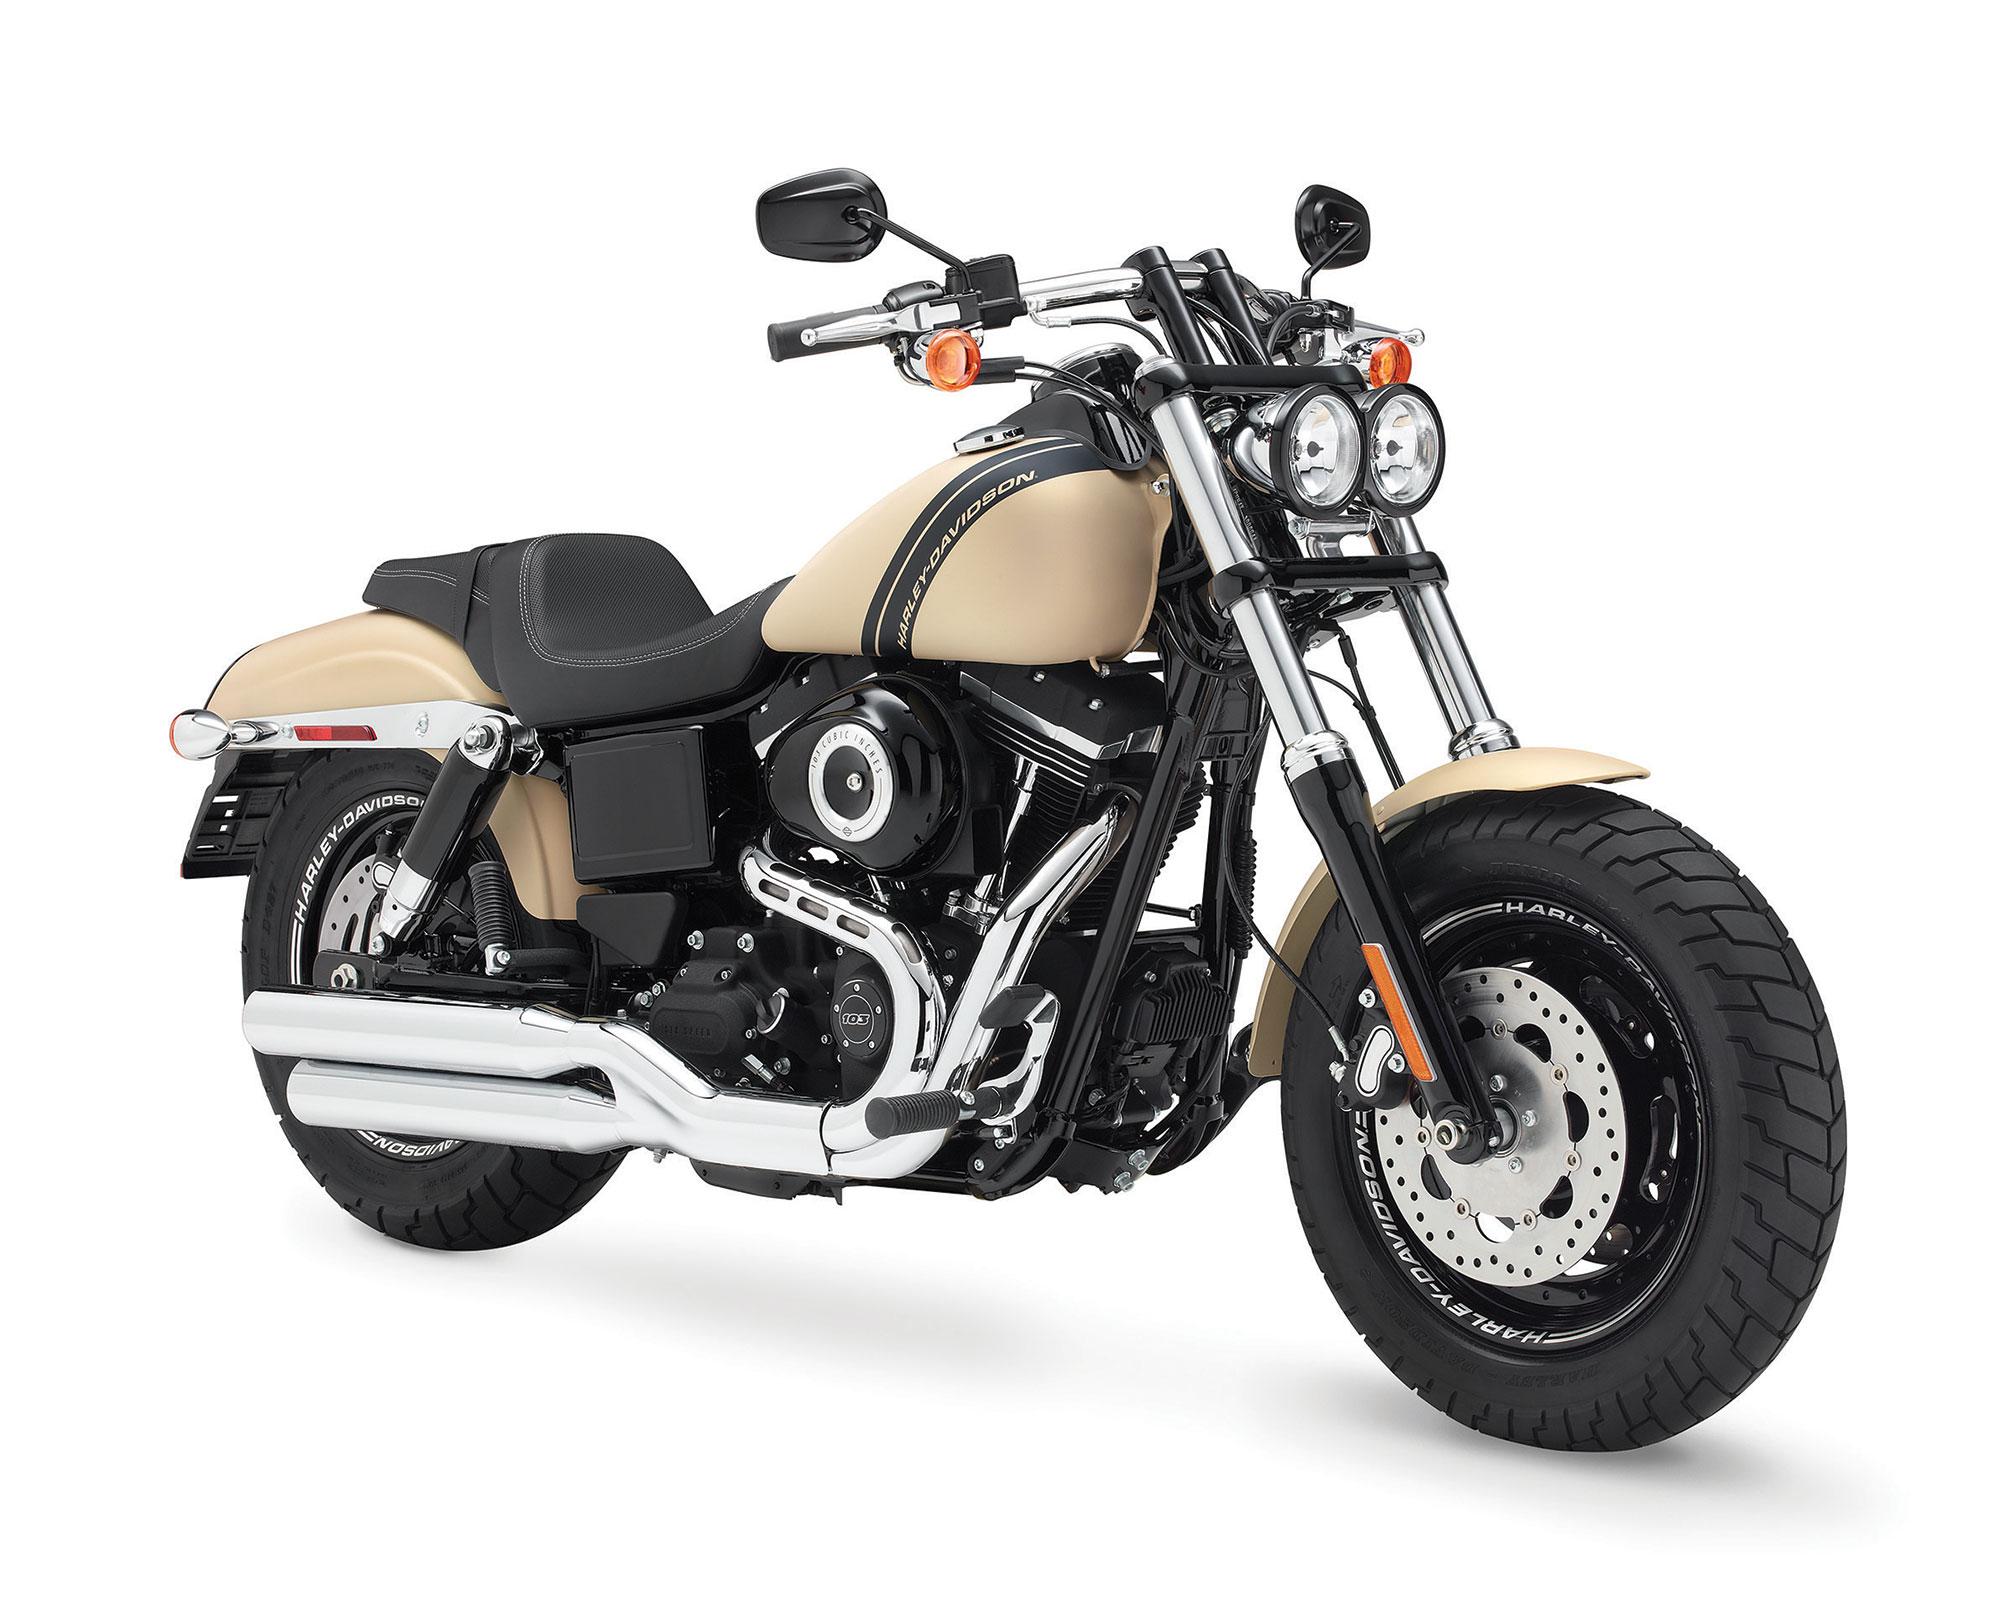 Indonesian Harley-Davidson distributor closes business